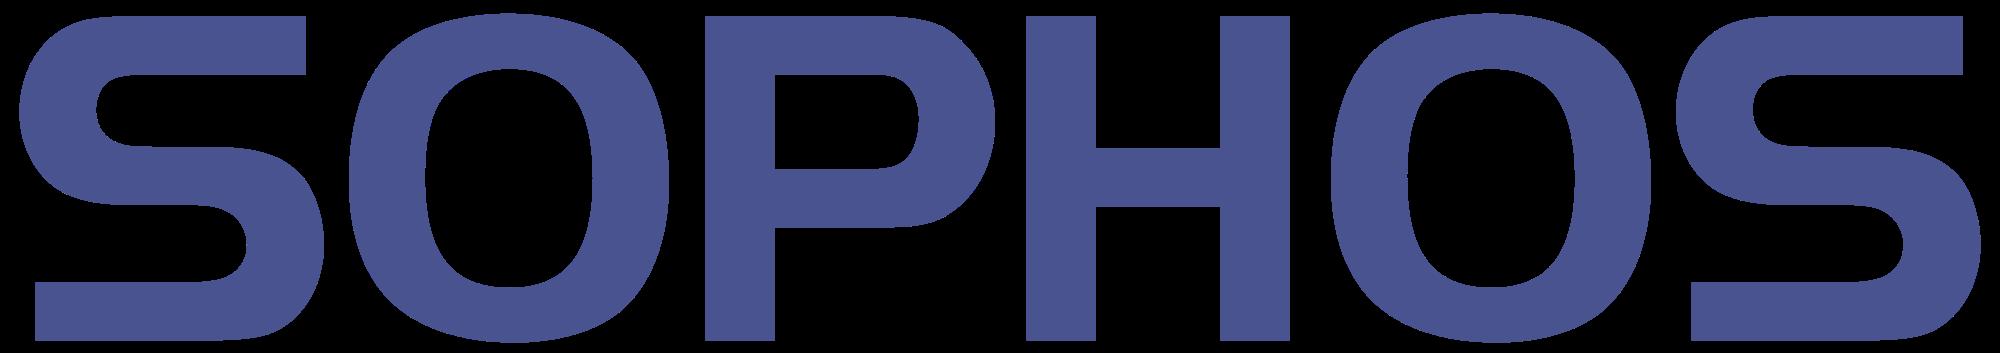 Sophos Plc. logo